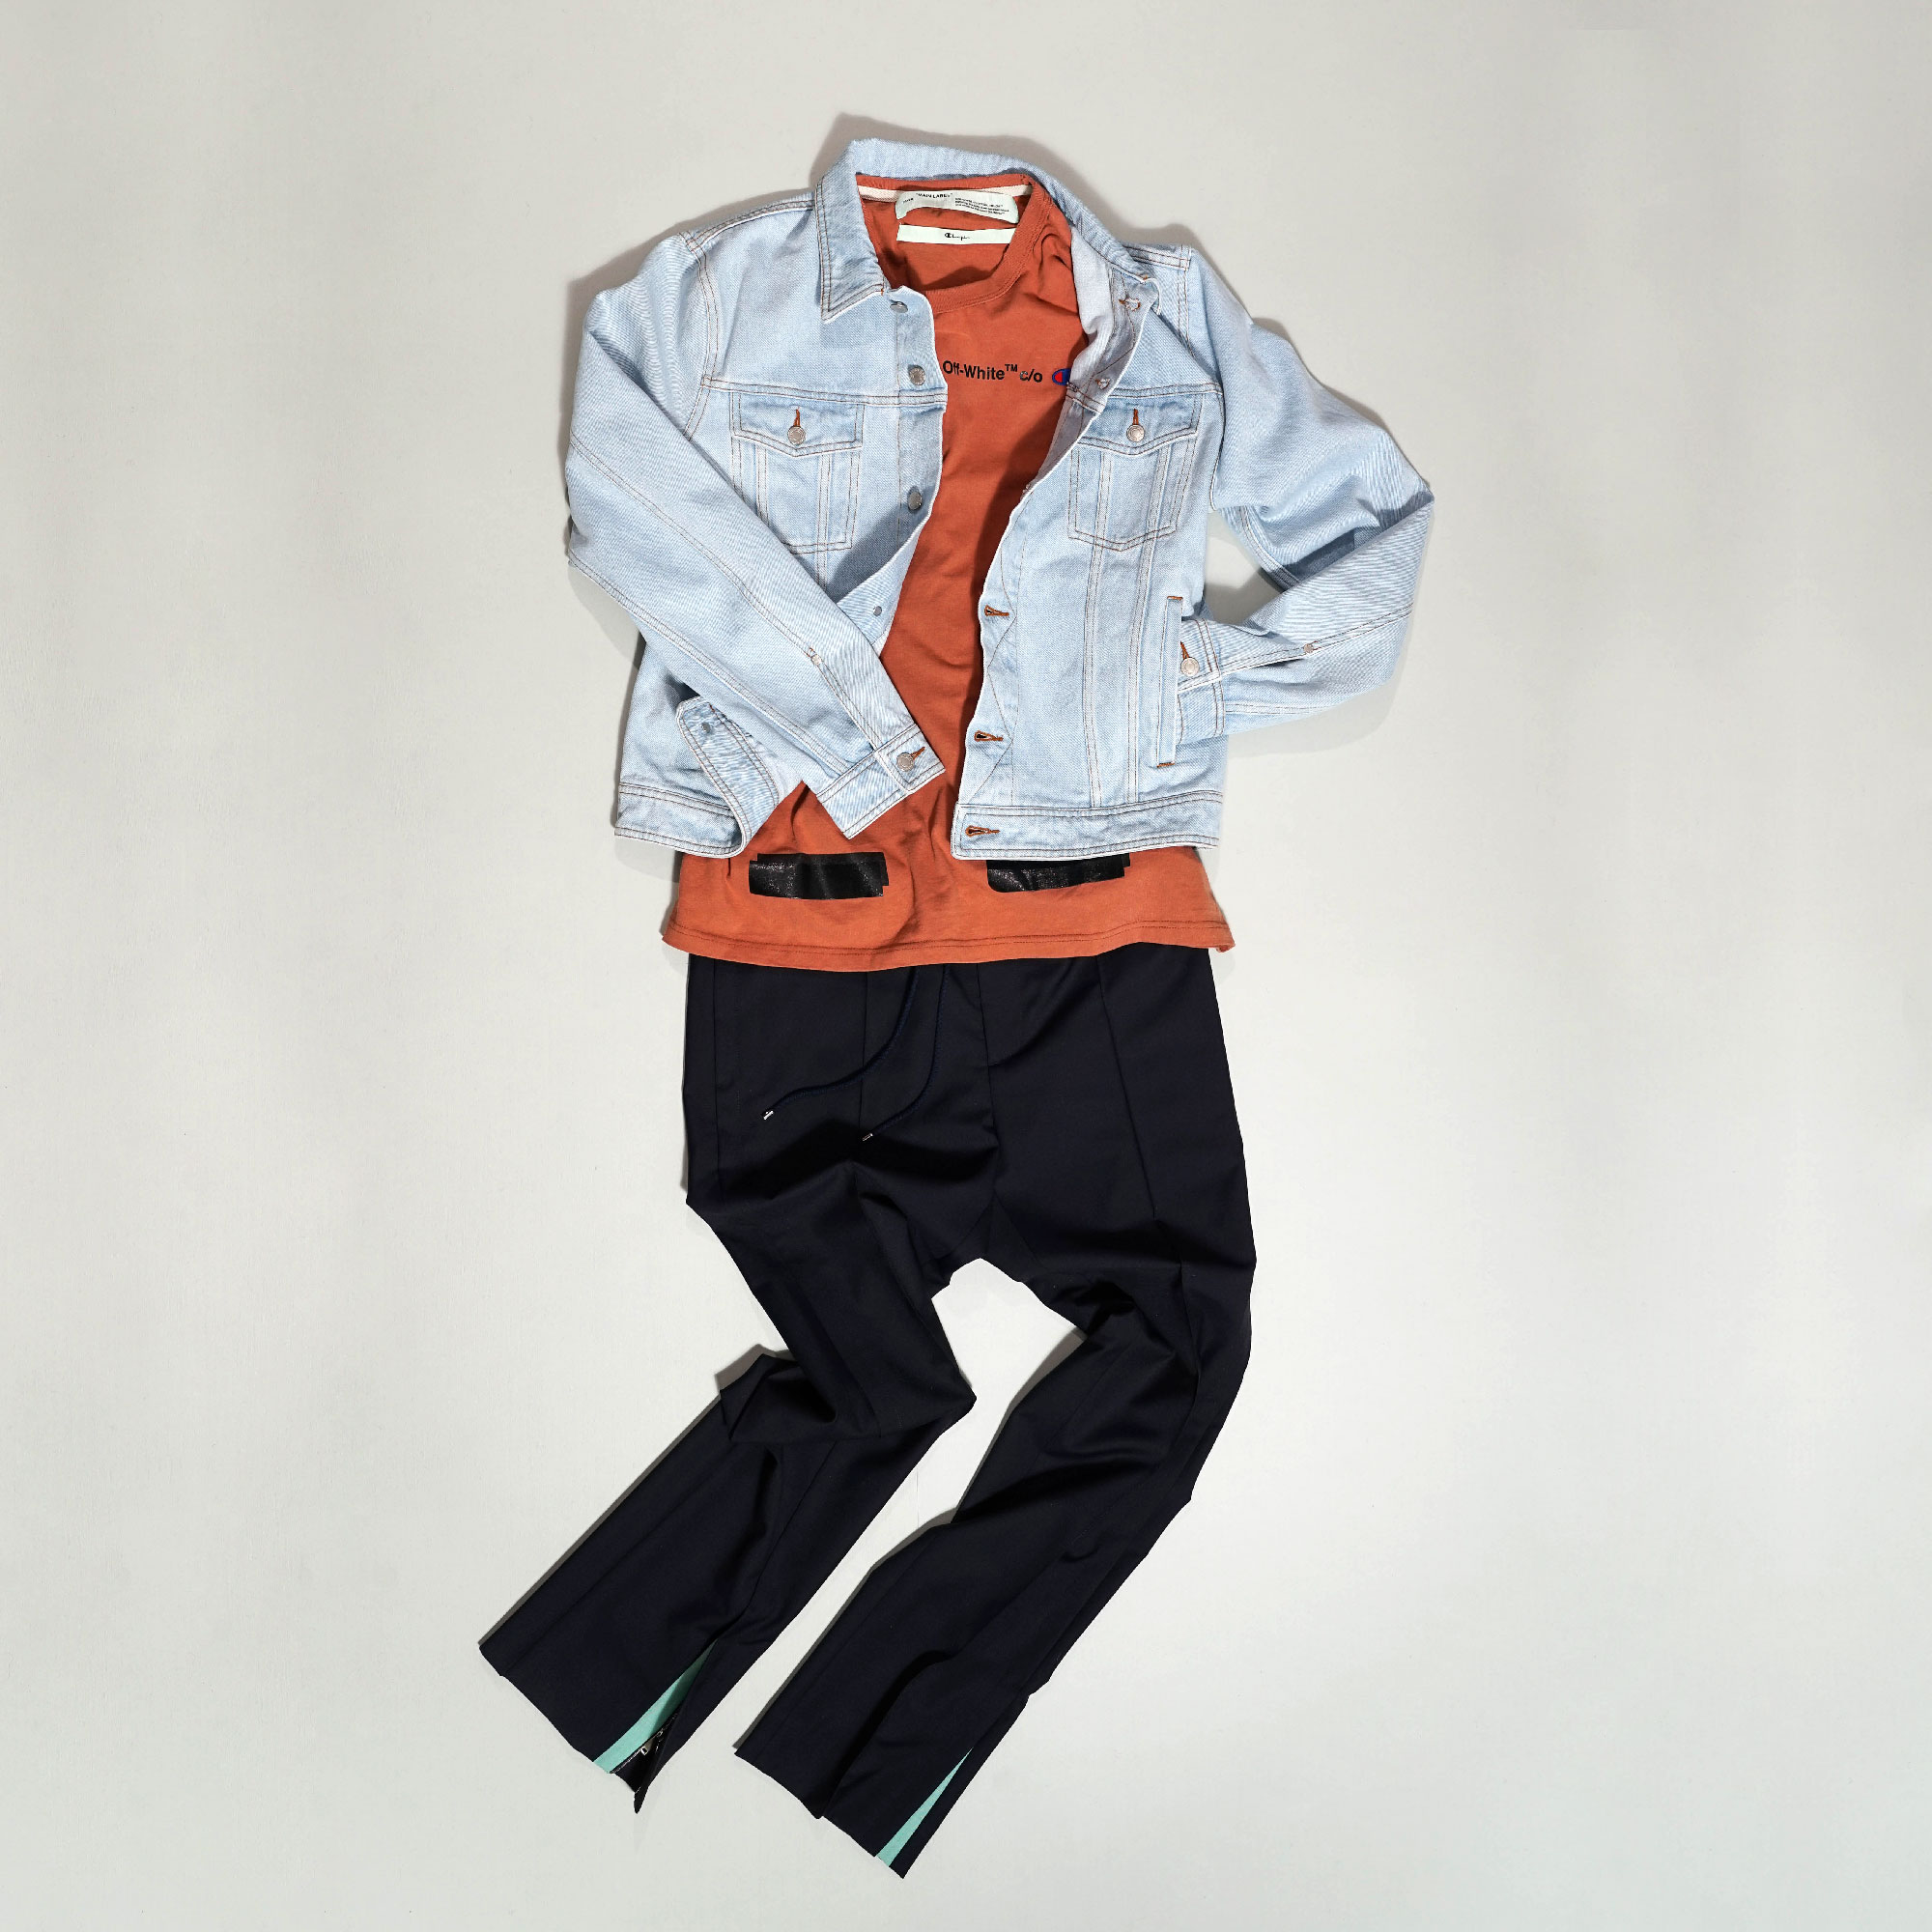 CaballeroCosmica-Fashion-Yusty3.jpg